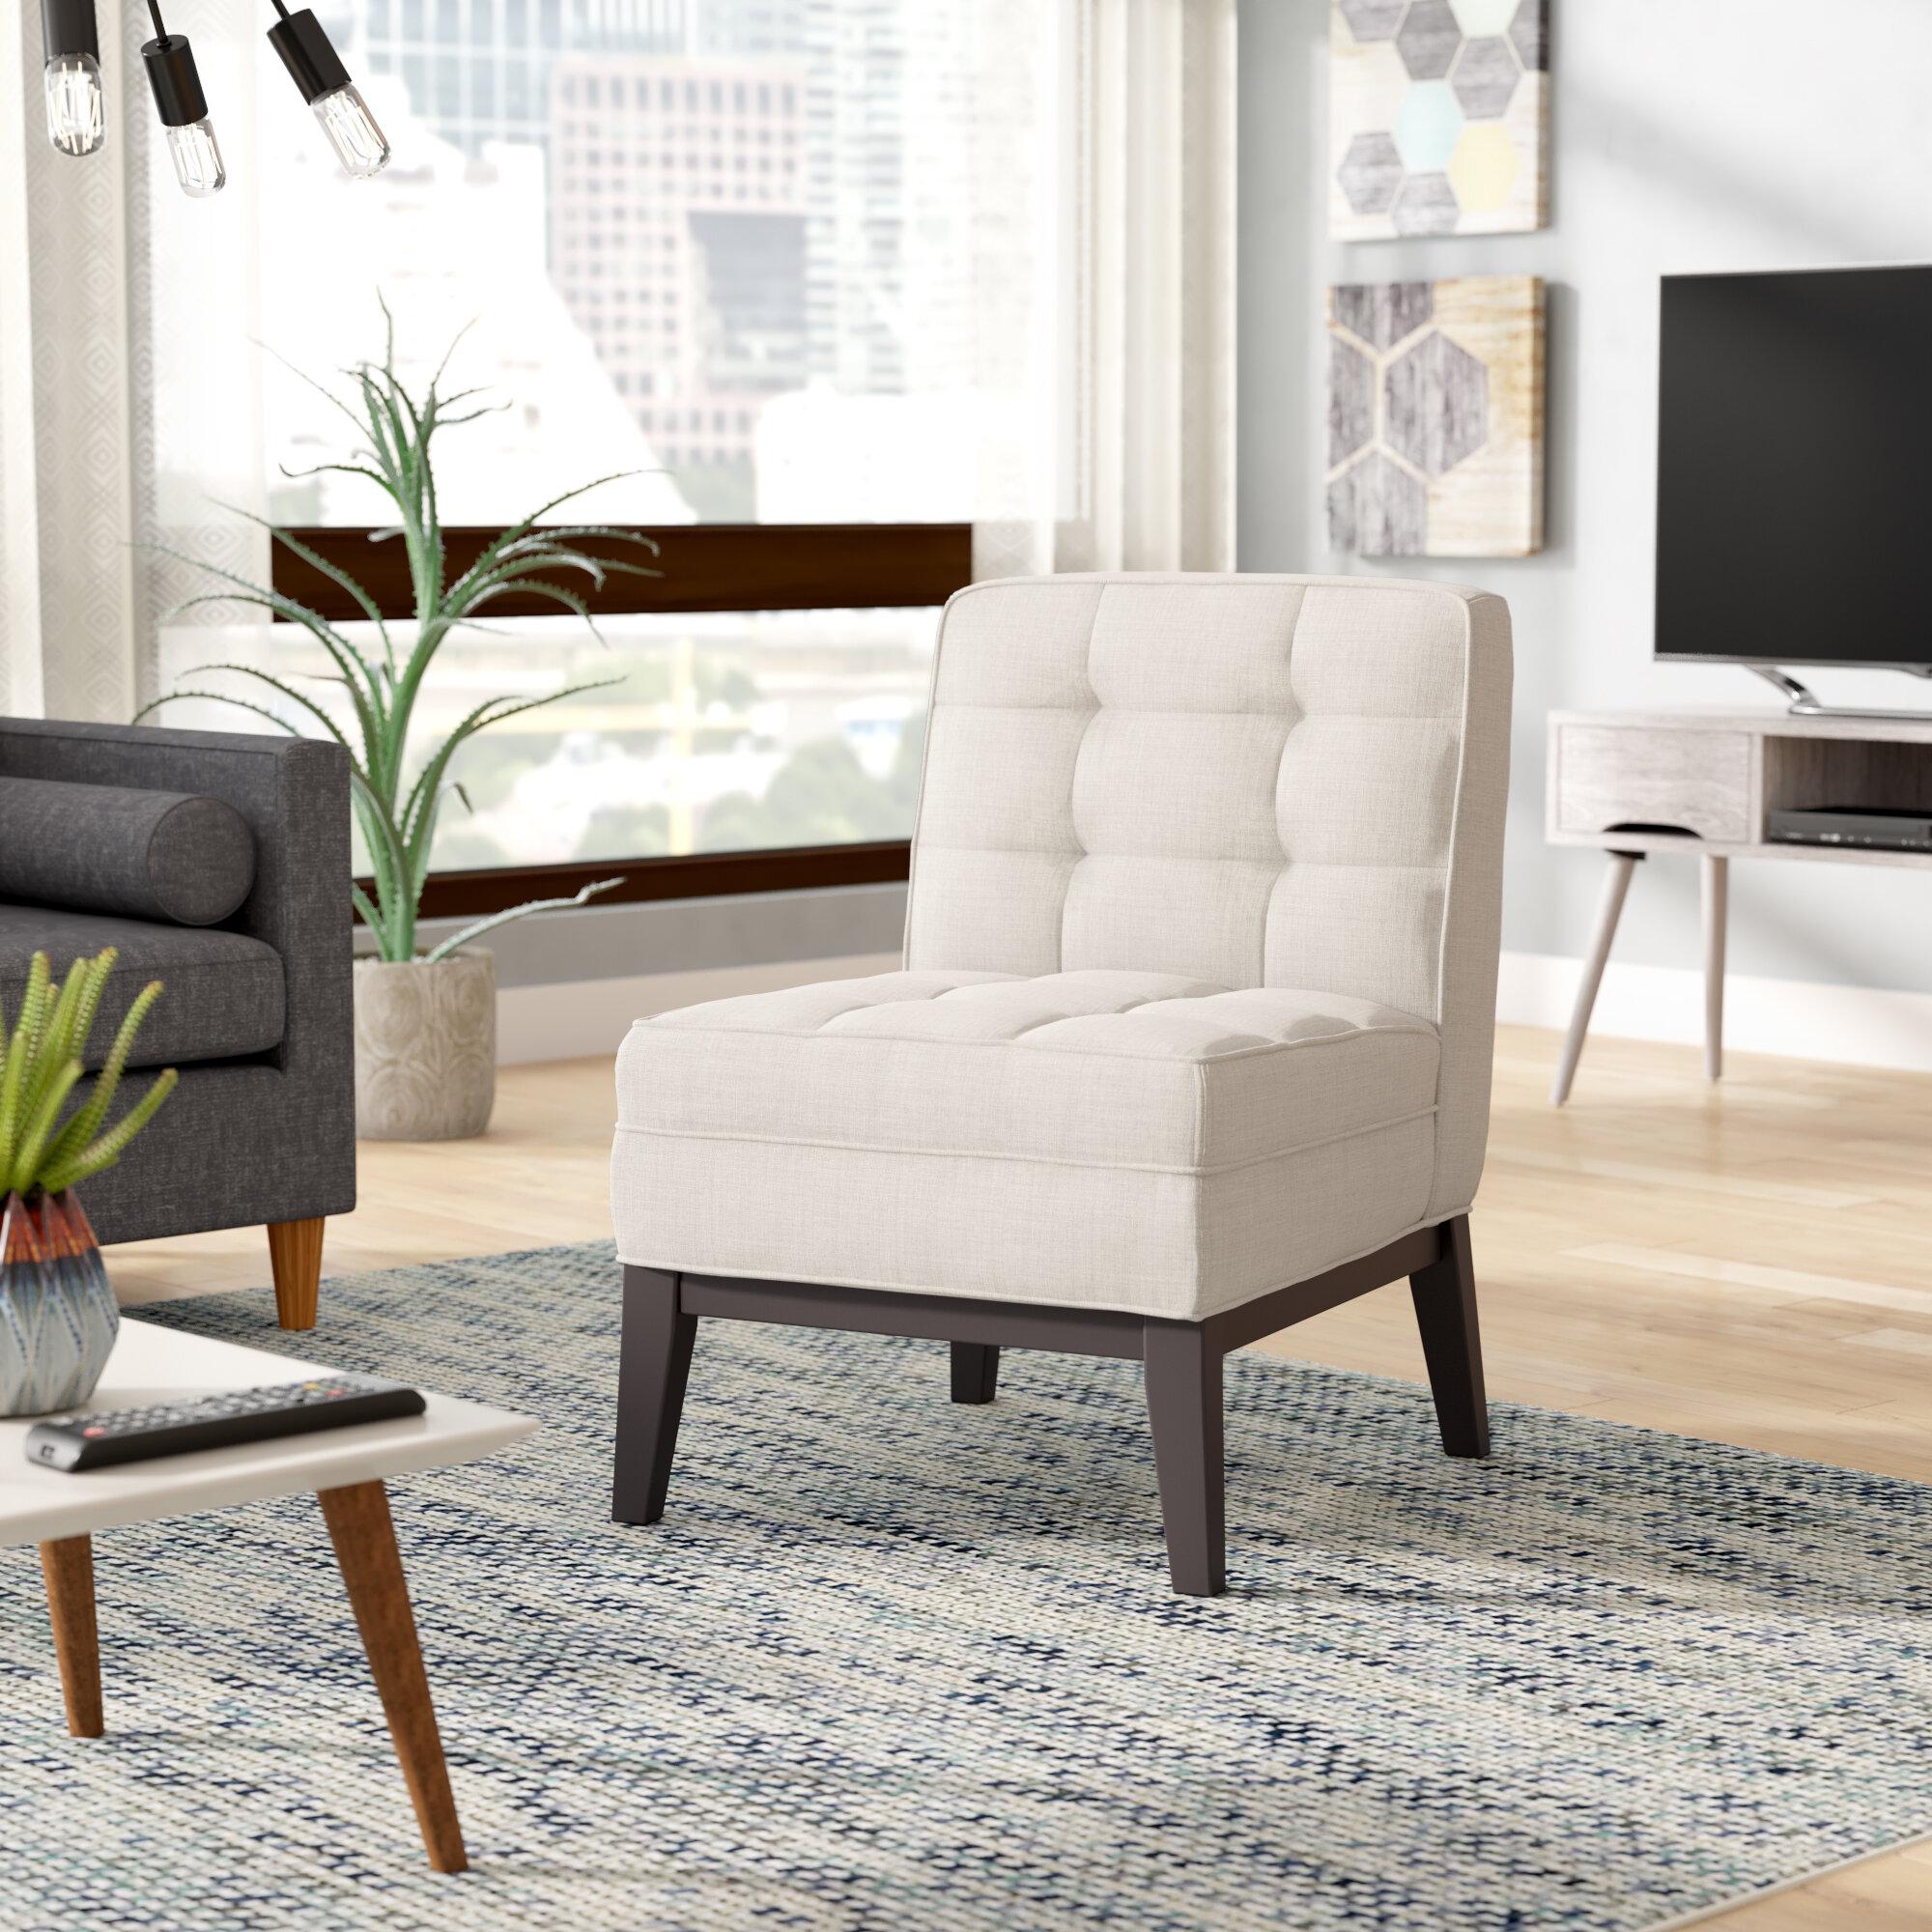 Brayden Studio Hilburn Slipper Chair Reviews Wayfair